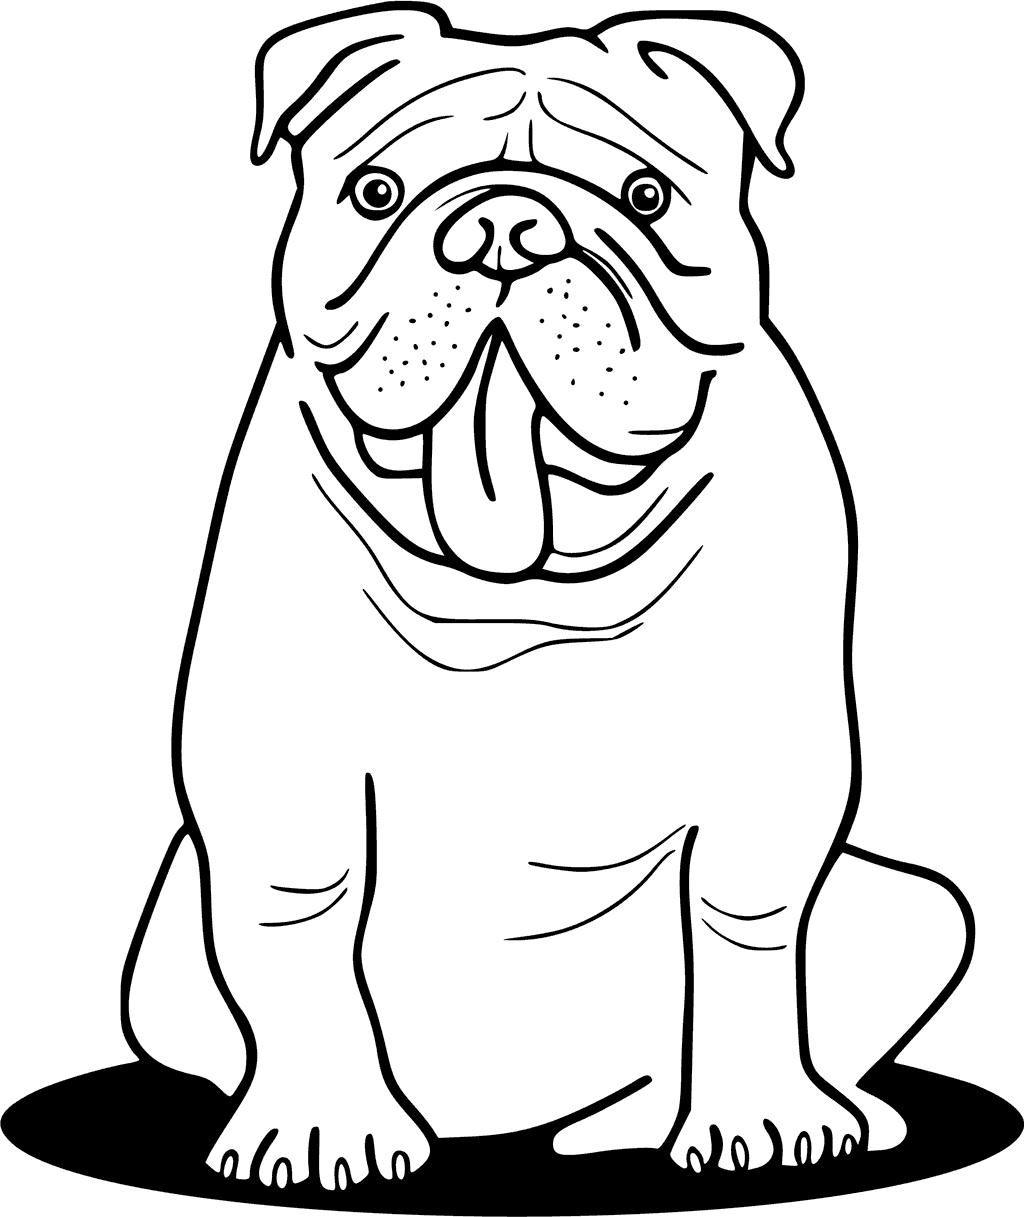 bulldog coloring pages to print | Bulldog Drawing Easy at GetDrawings.com | Free for ...